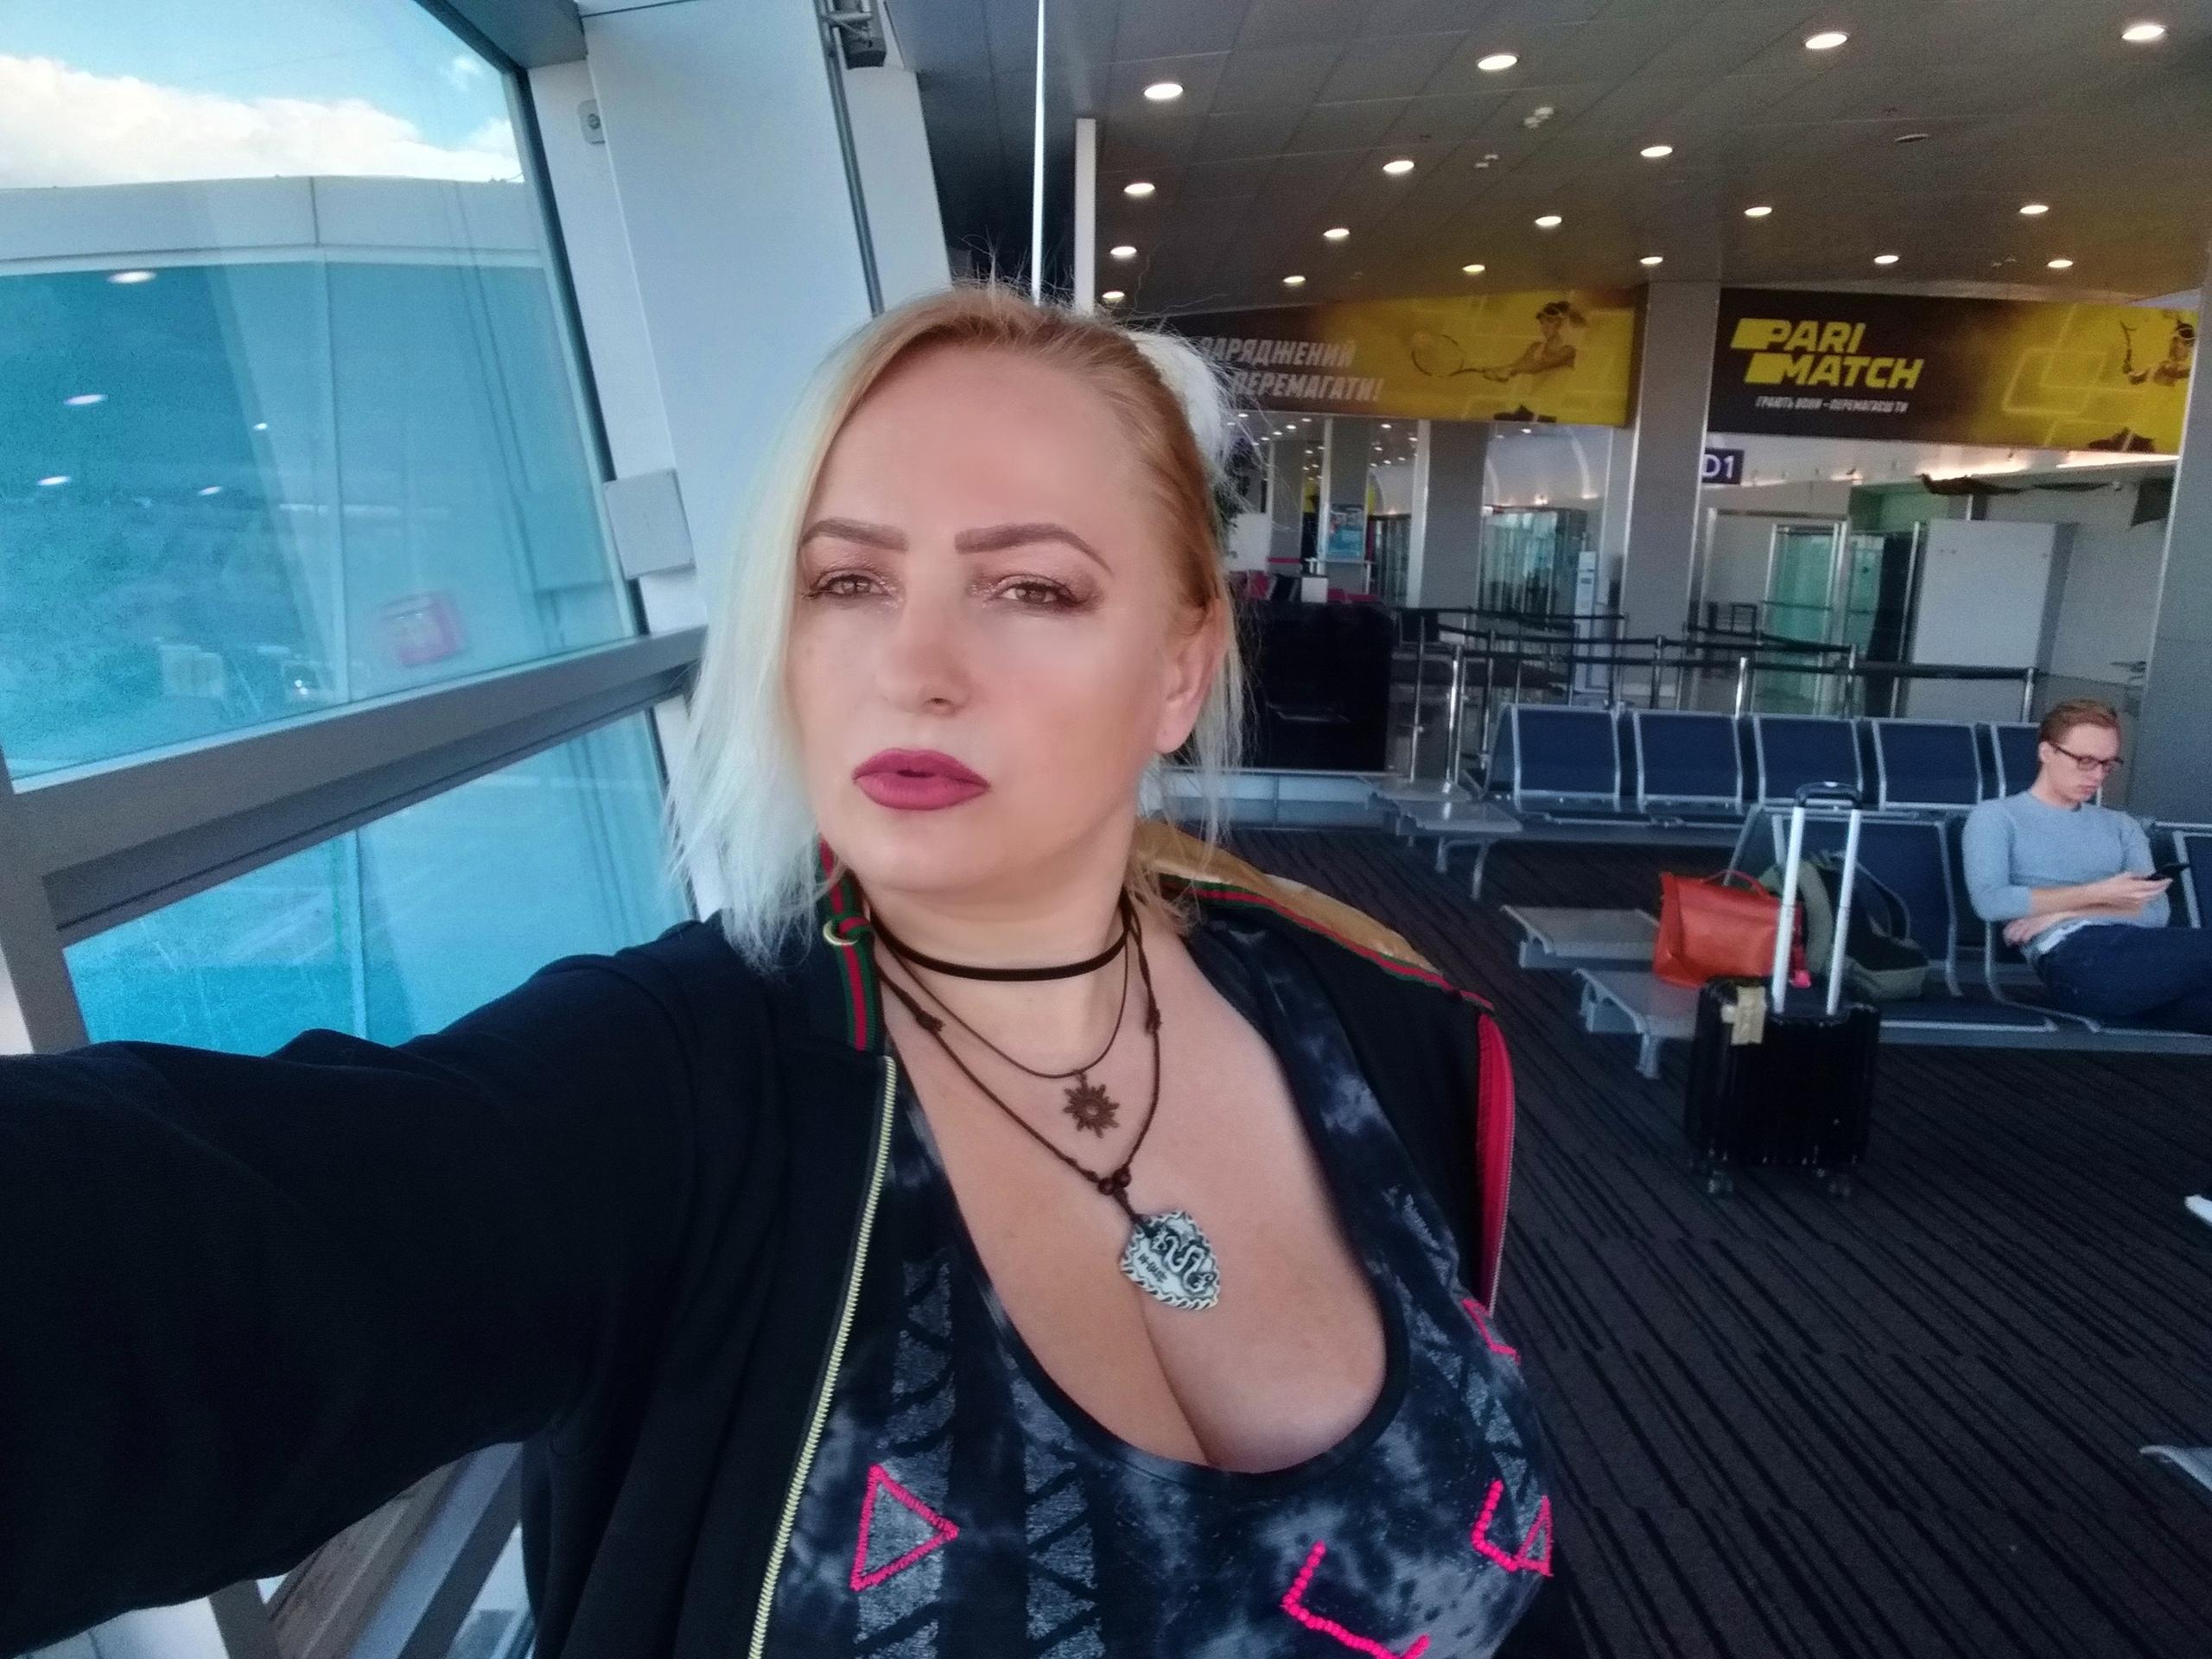 Елена Руденко (Валтея). Мои путешествия. Таиланд ( 2019 г. осень) ФОТО. WR1z4tJDTdE